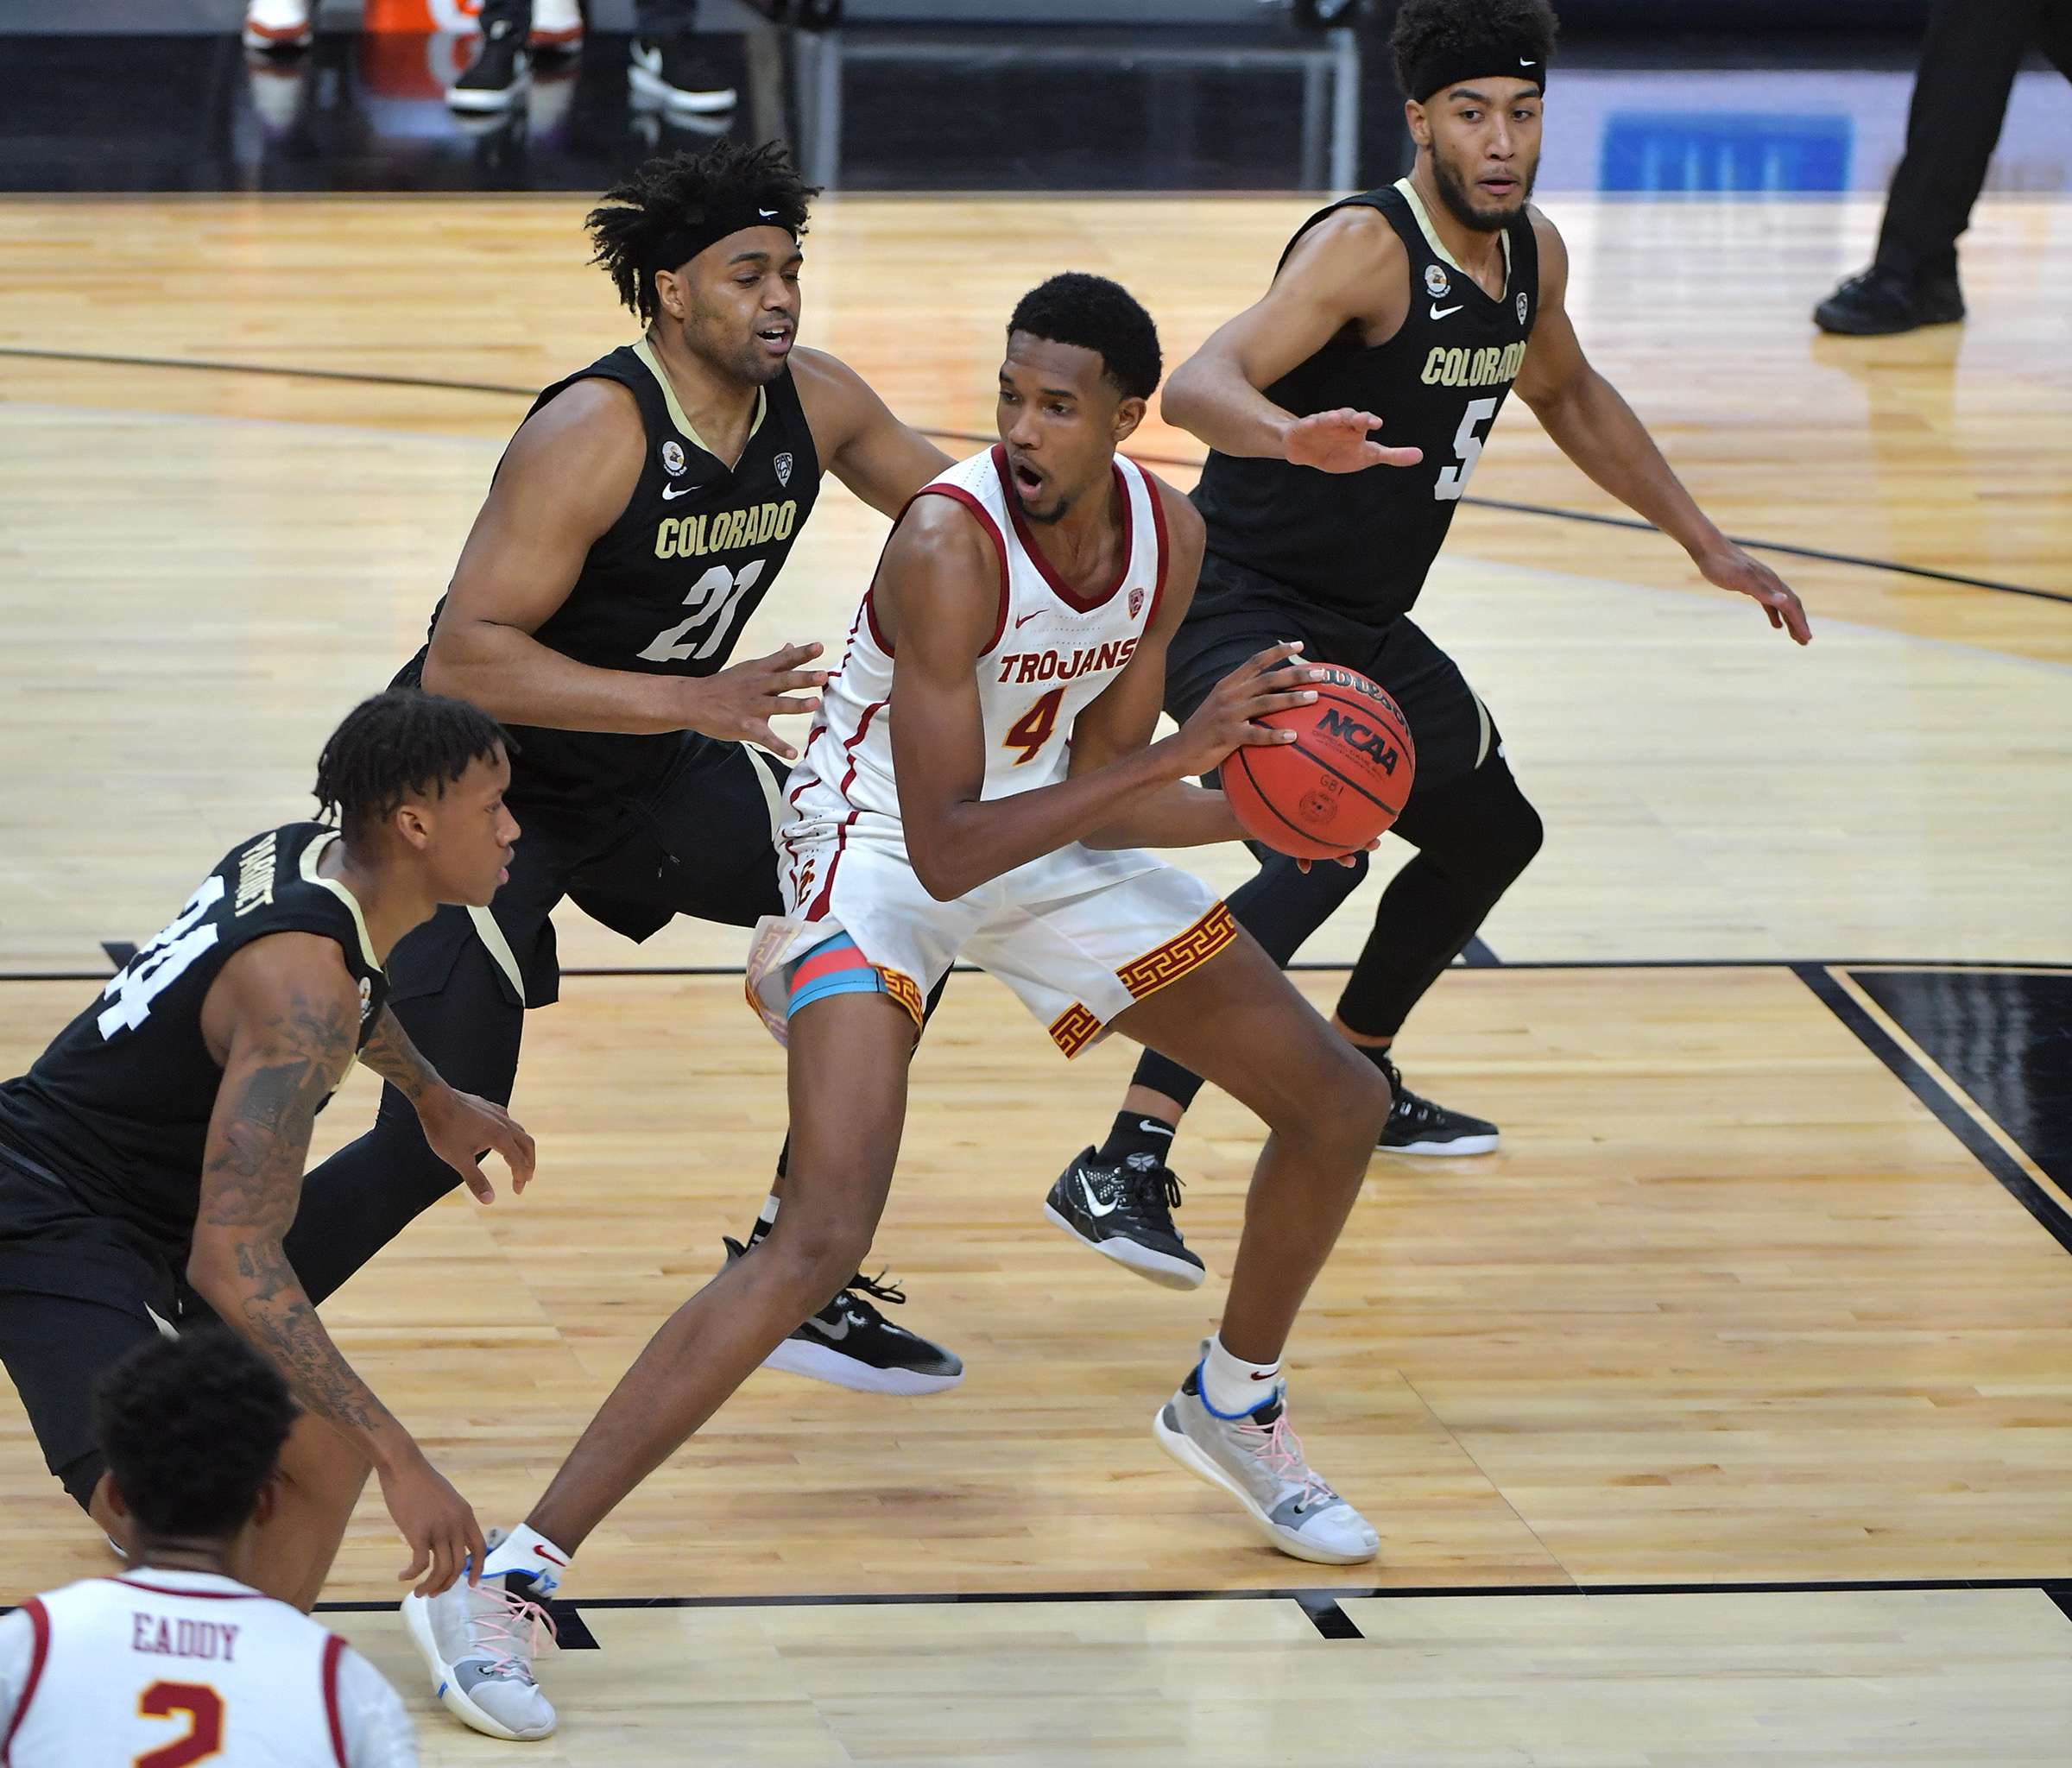 NCAA Basketball: PAC-12 Conference Tournament Colorado vs USC